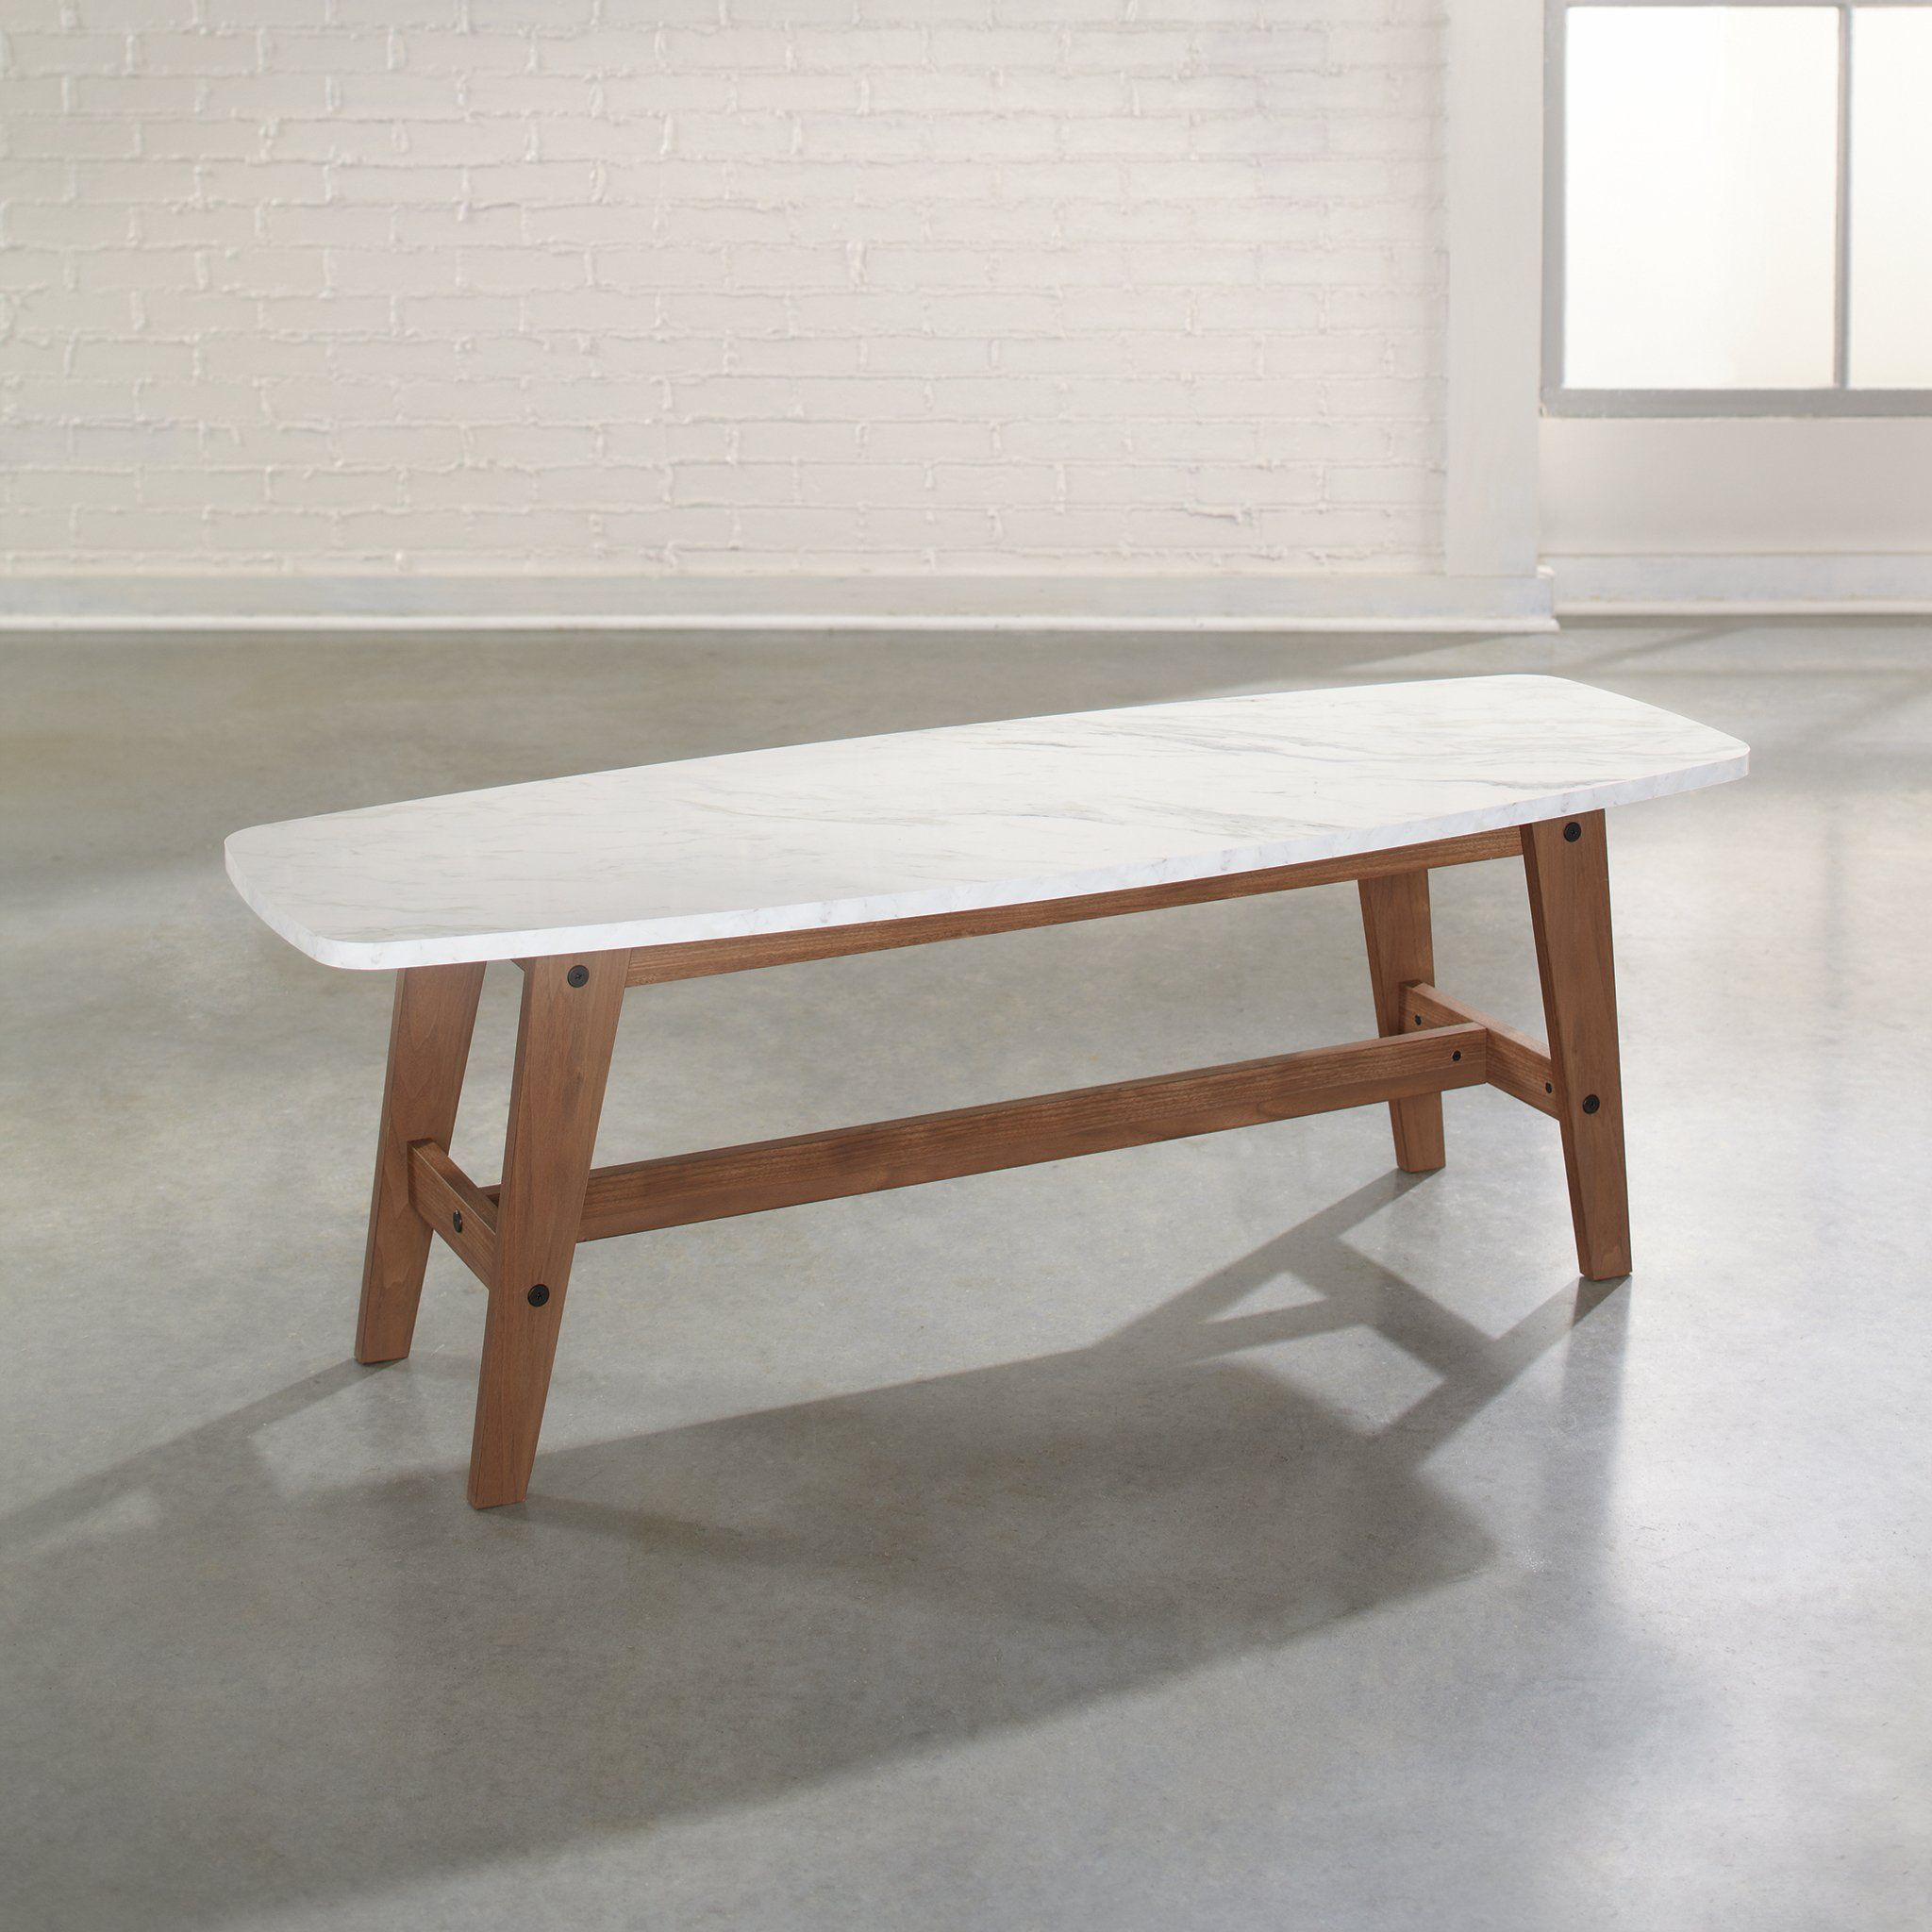 Fine Walnut Coffee Table Harvy Park Marble Coffee Table Coffee Table Faux Marble Coffee Table [ 2048 x 2048 Pixel ]